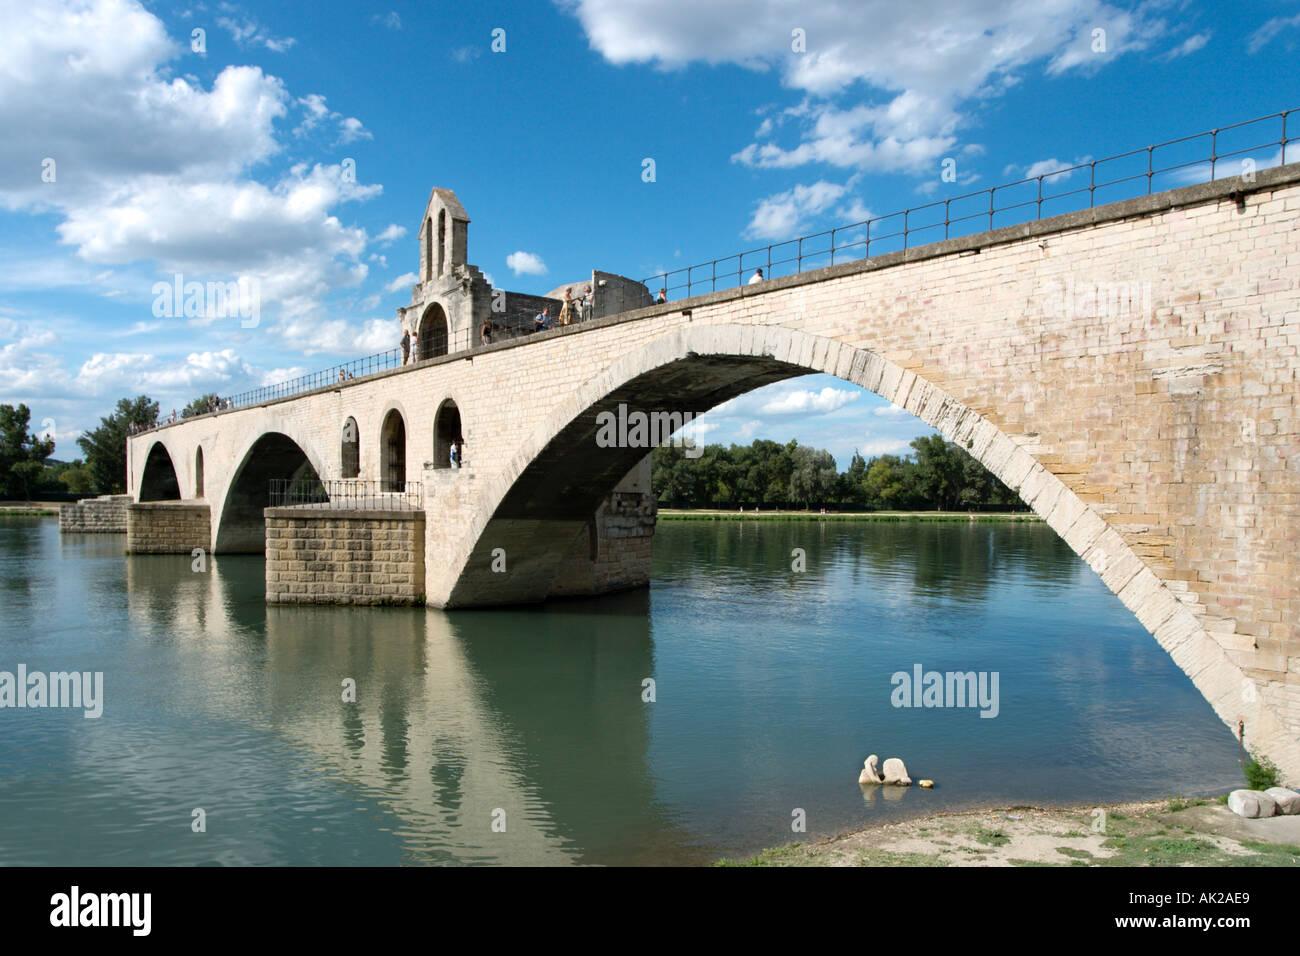 Pont d'Avignon (Pont St Benezet), River Rhone, Avignon, Provence, France - Stock Image